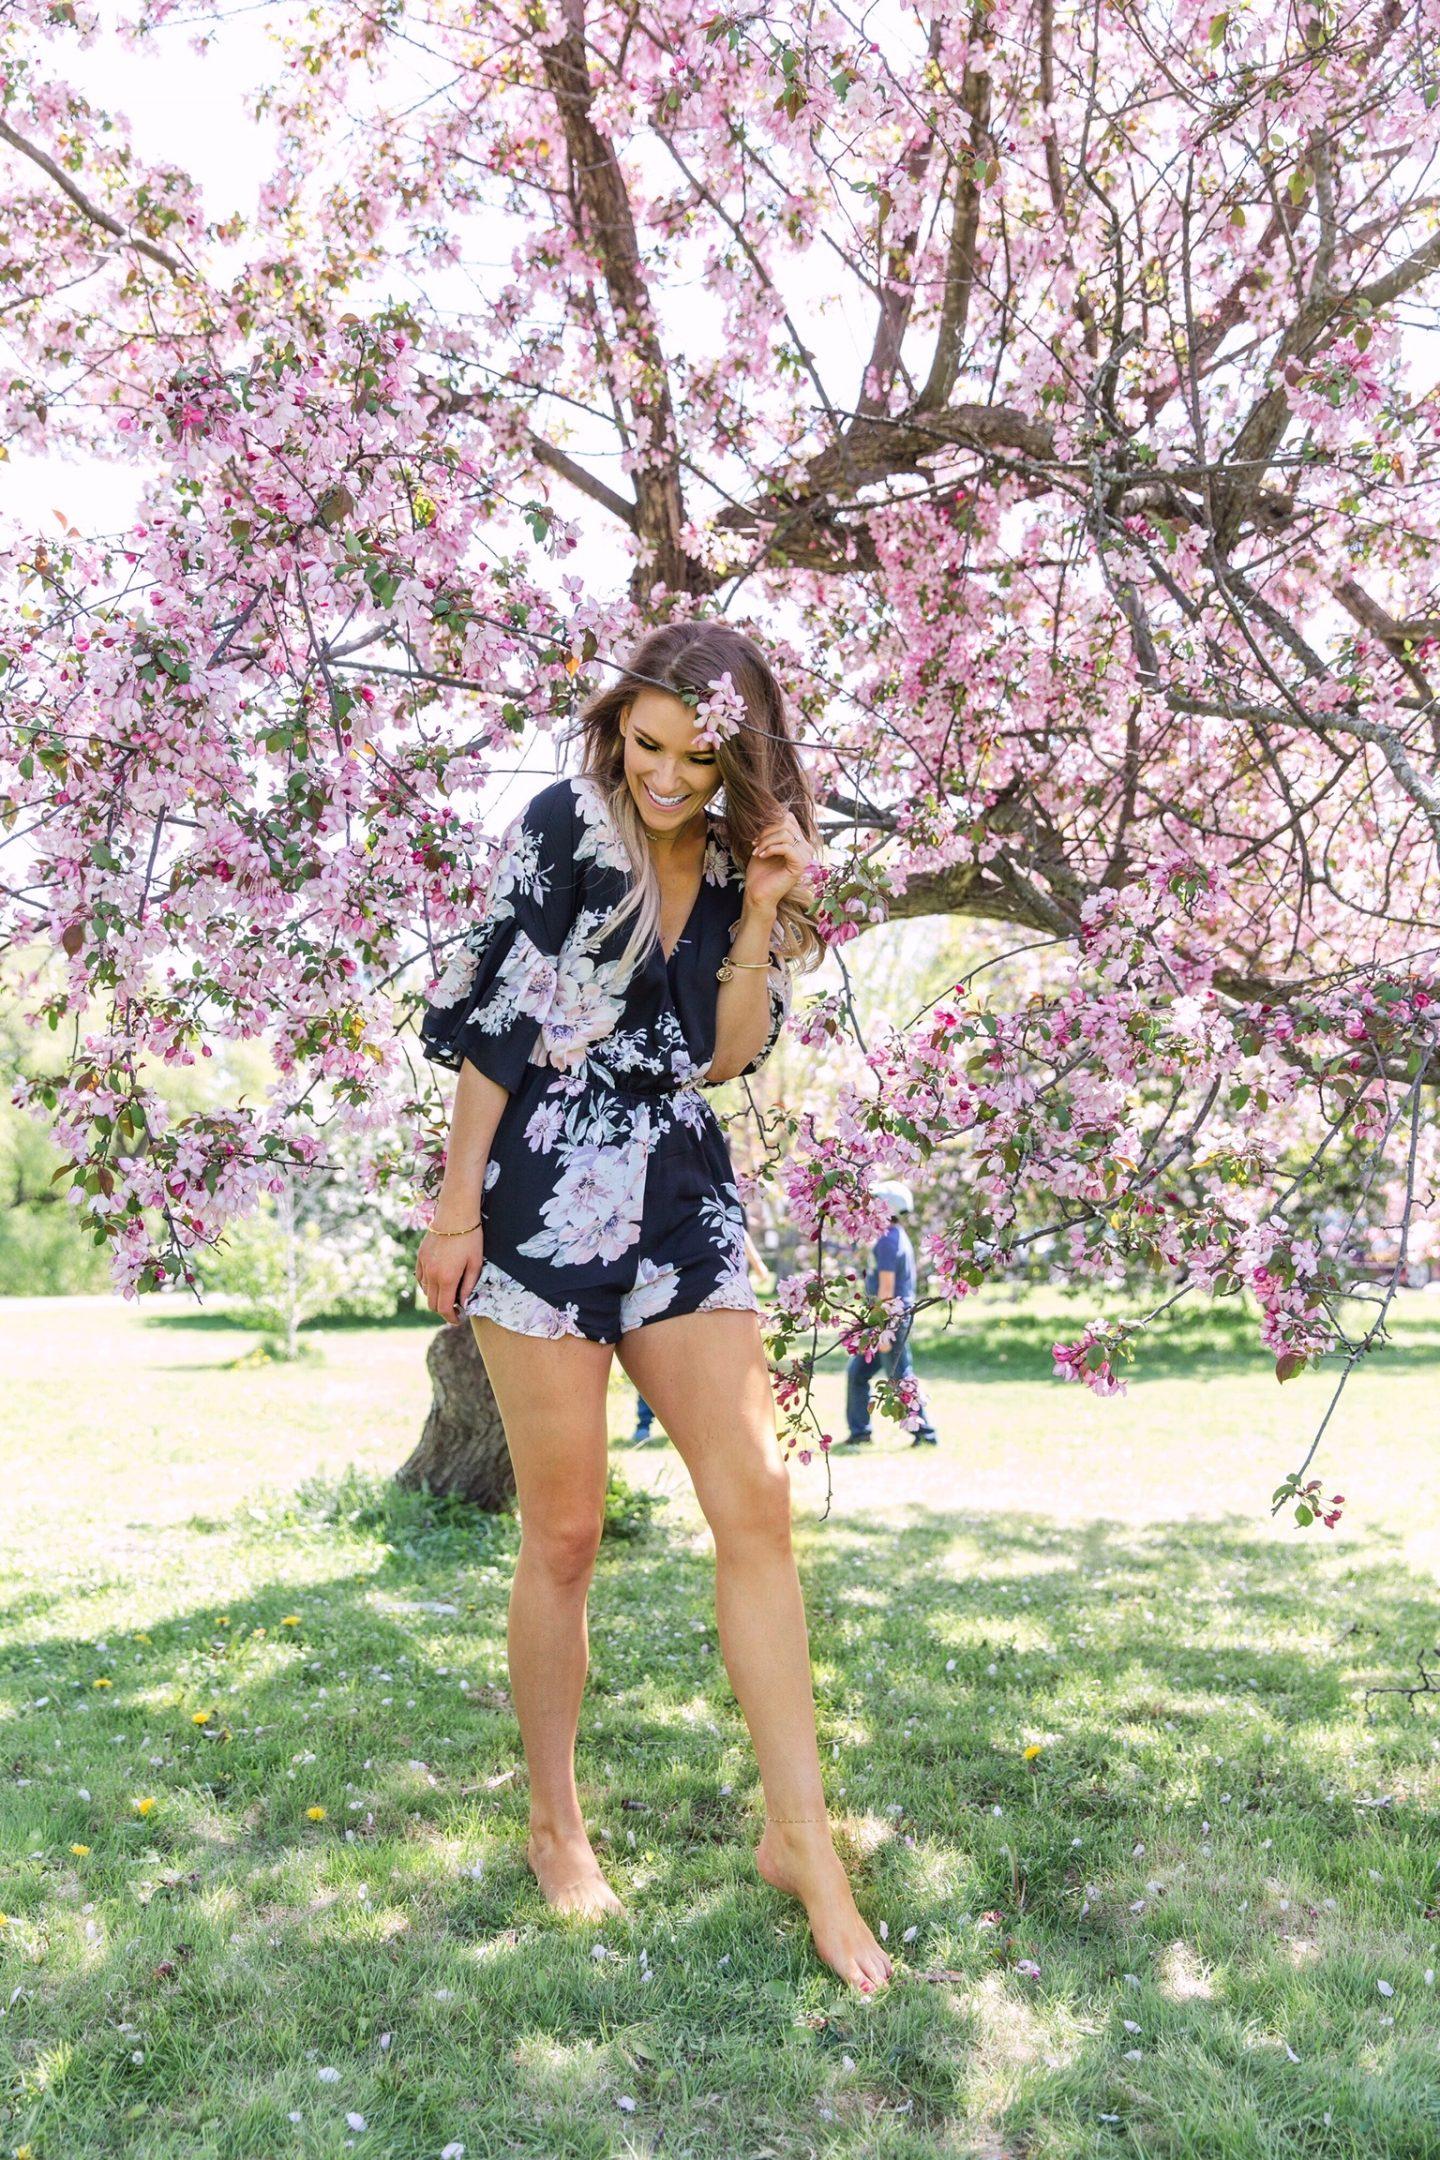 canadian-fashion-blog-floral-romper-amanda-conquer-ottawa-cherry-blossom-trees-1440x2160.jpg